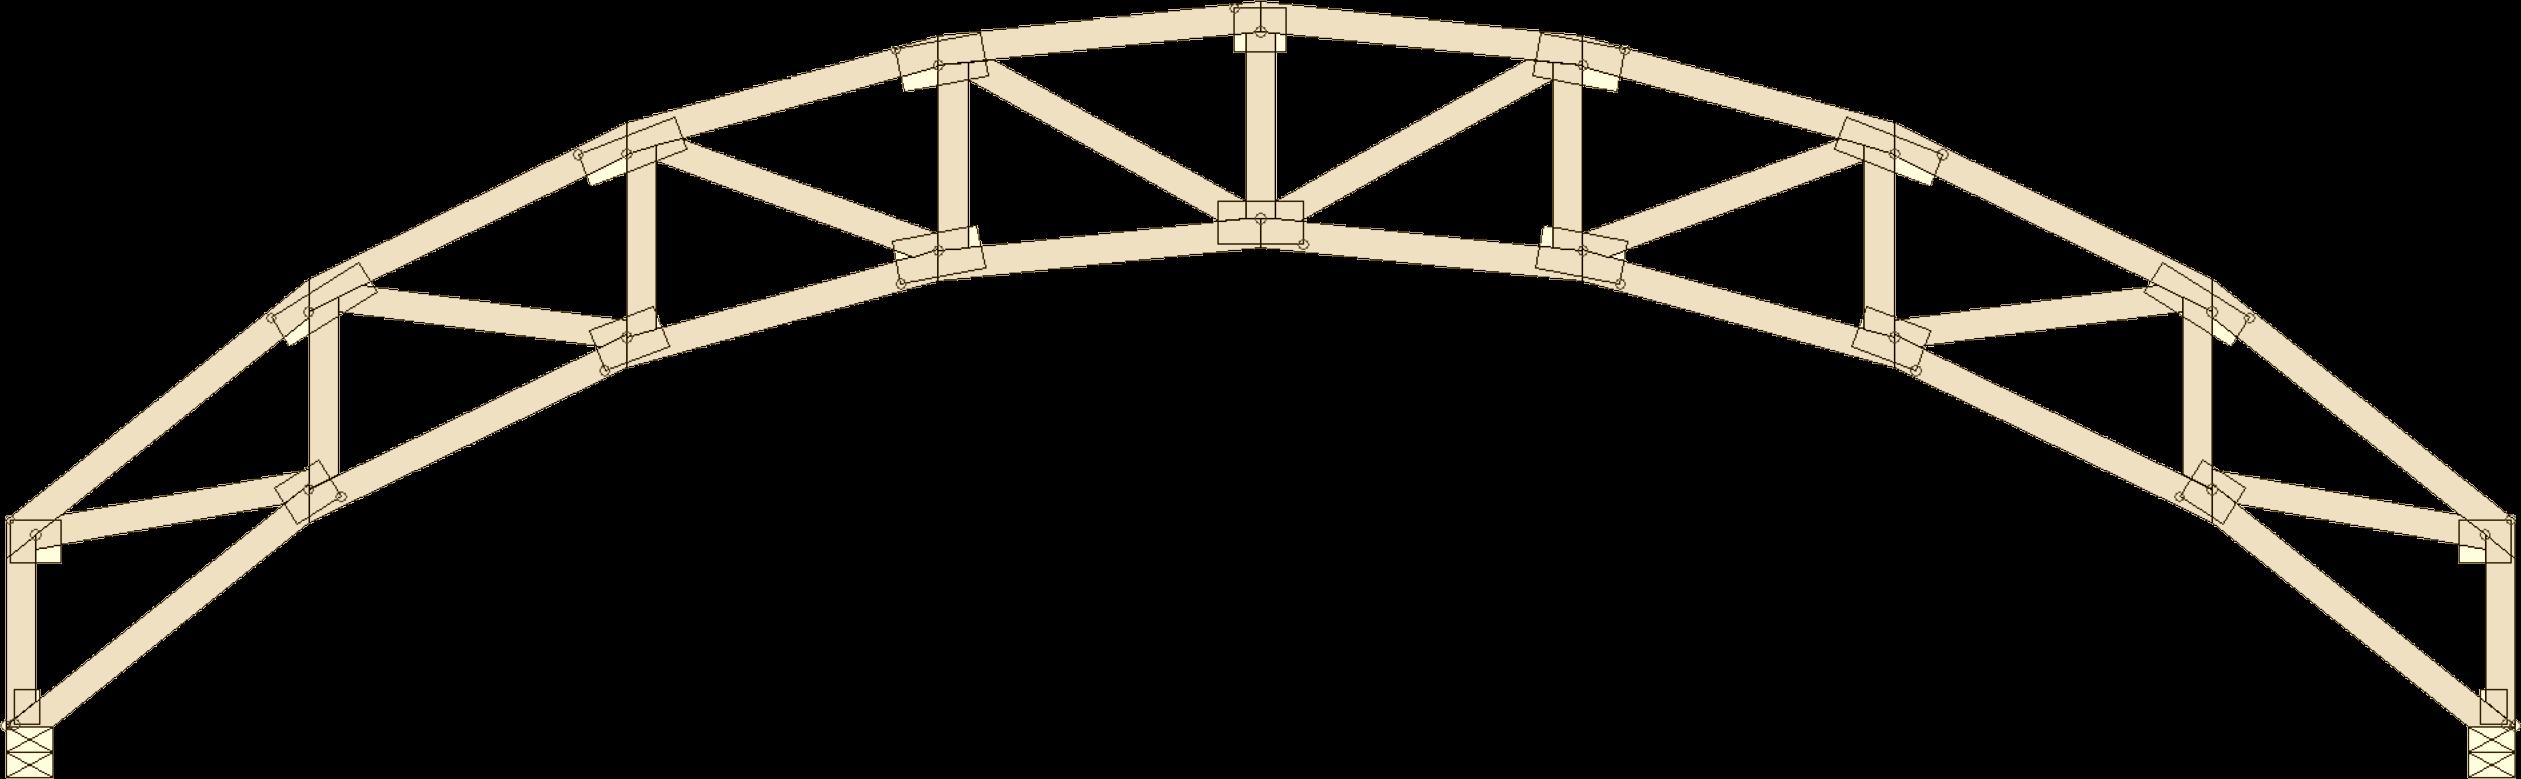 Pin scissor trusses on pinterest for Scissor roof truss prices